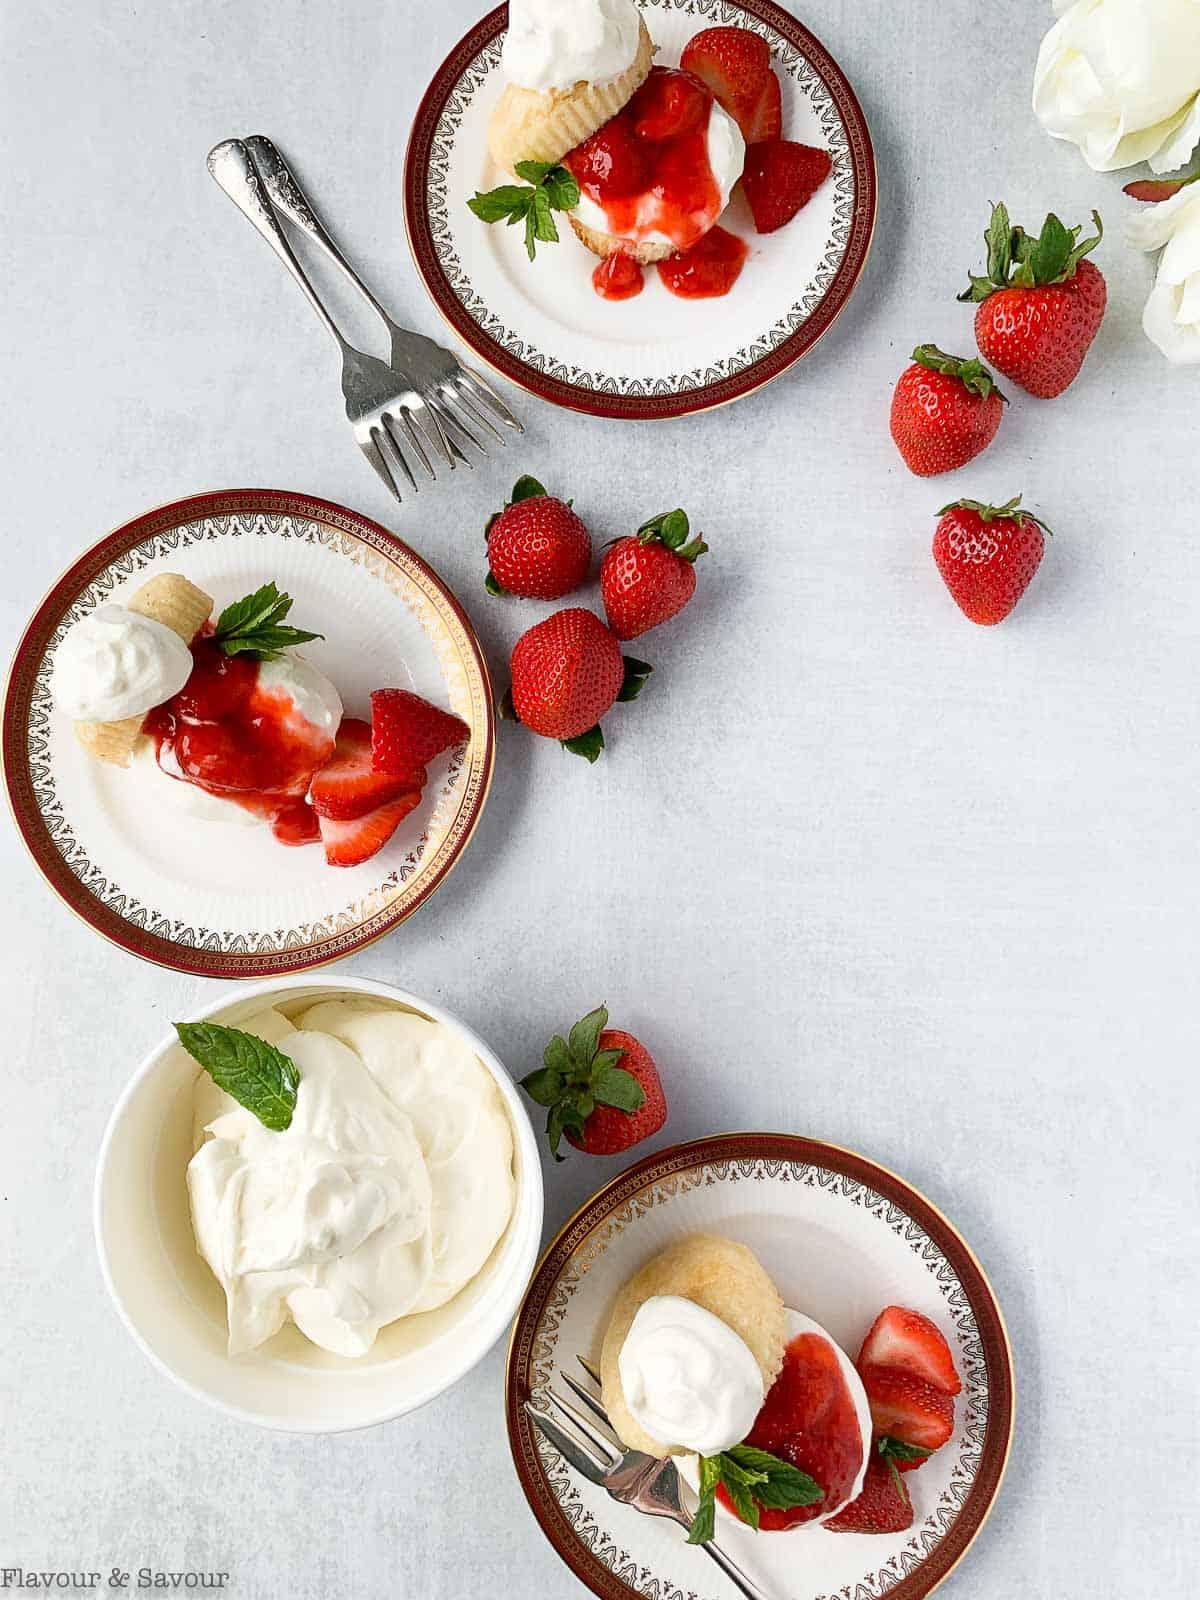 Three dessert plates with strawberry shortcake.